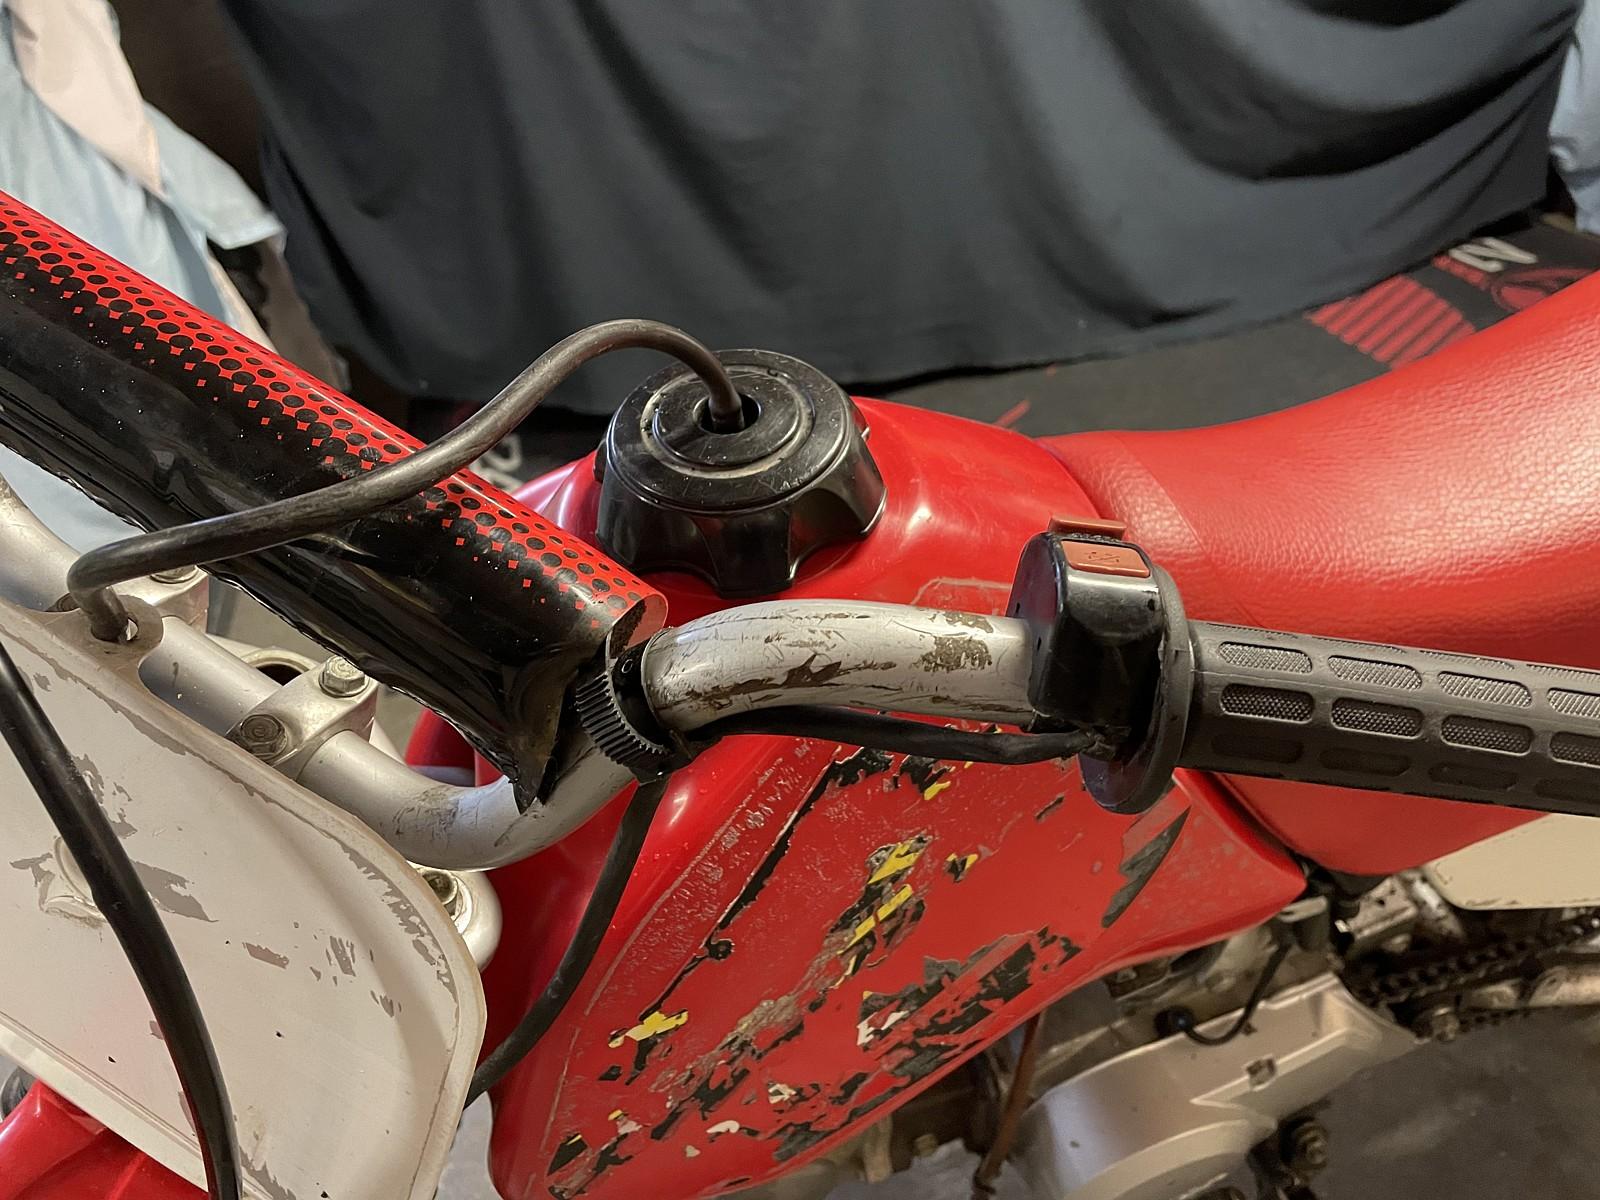 6AE83E82-7981-487F-8119-181F596FE8E7 - Godcho - Motocross Pictures - Vital MX